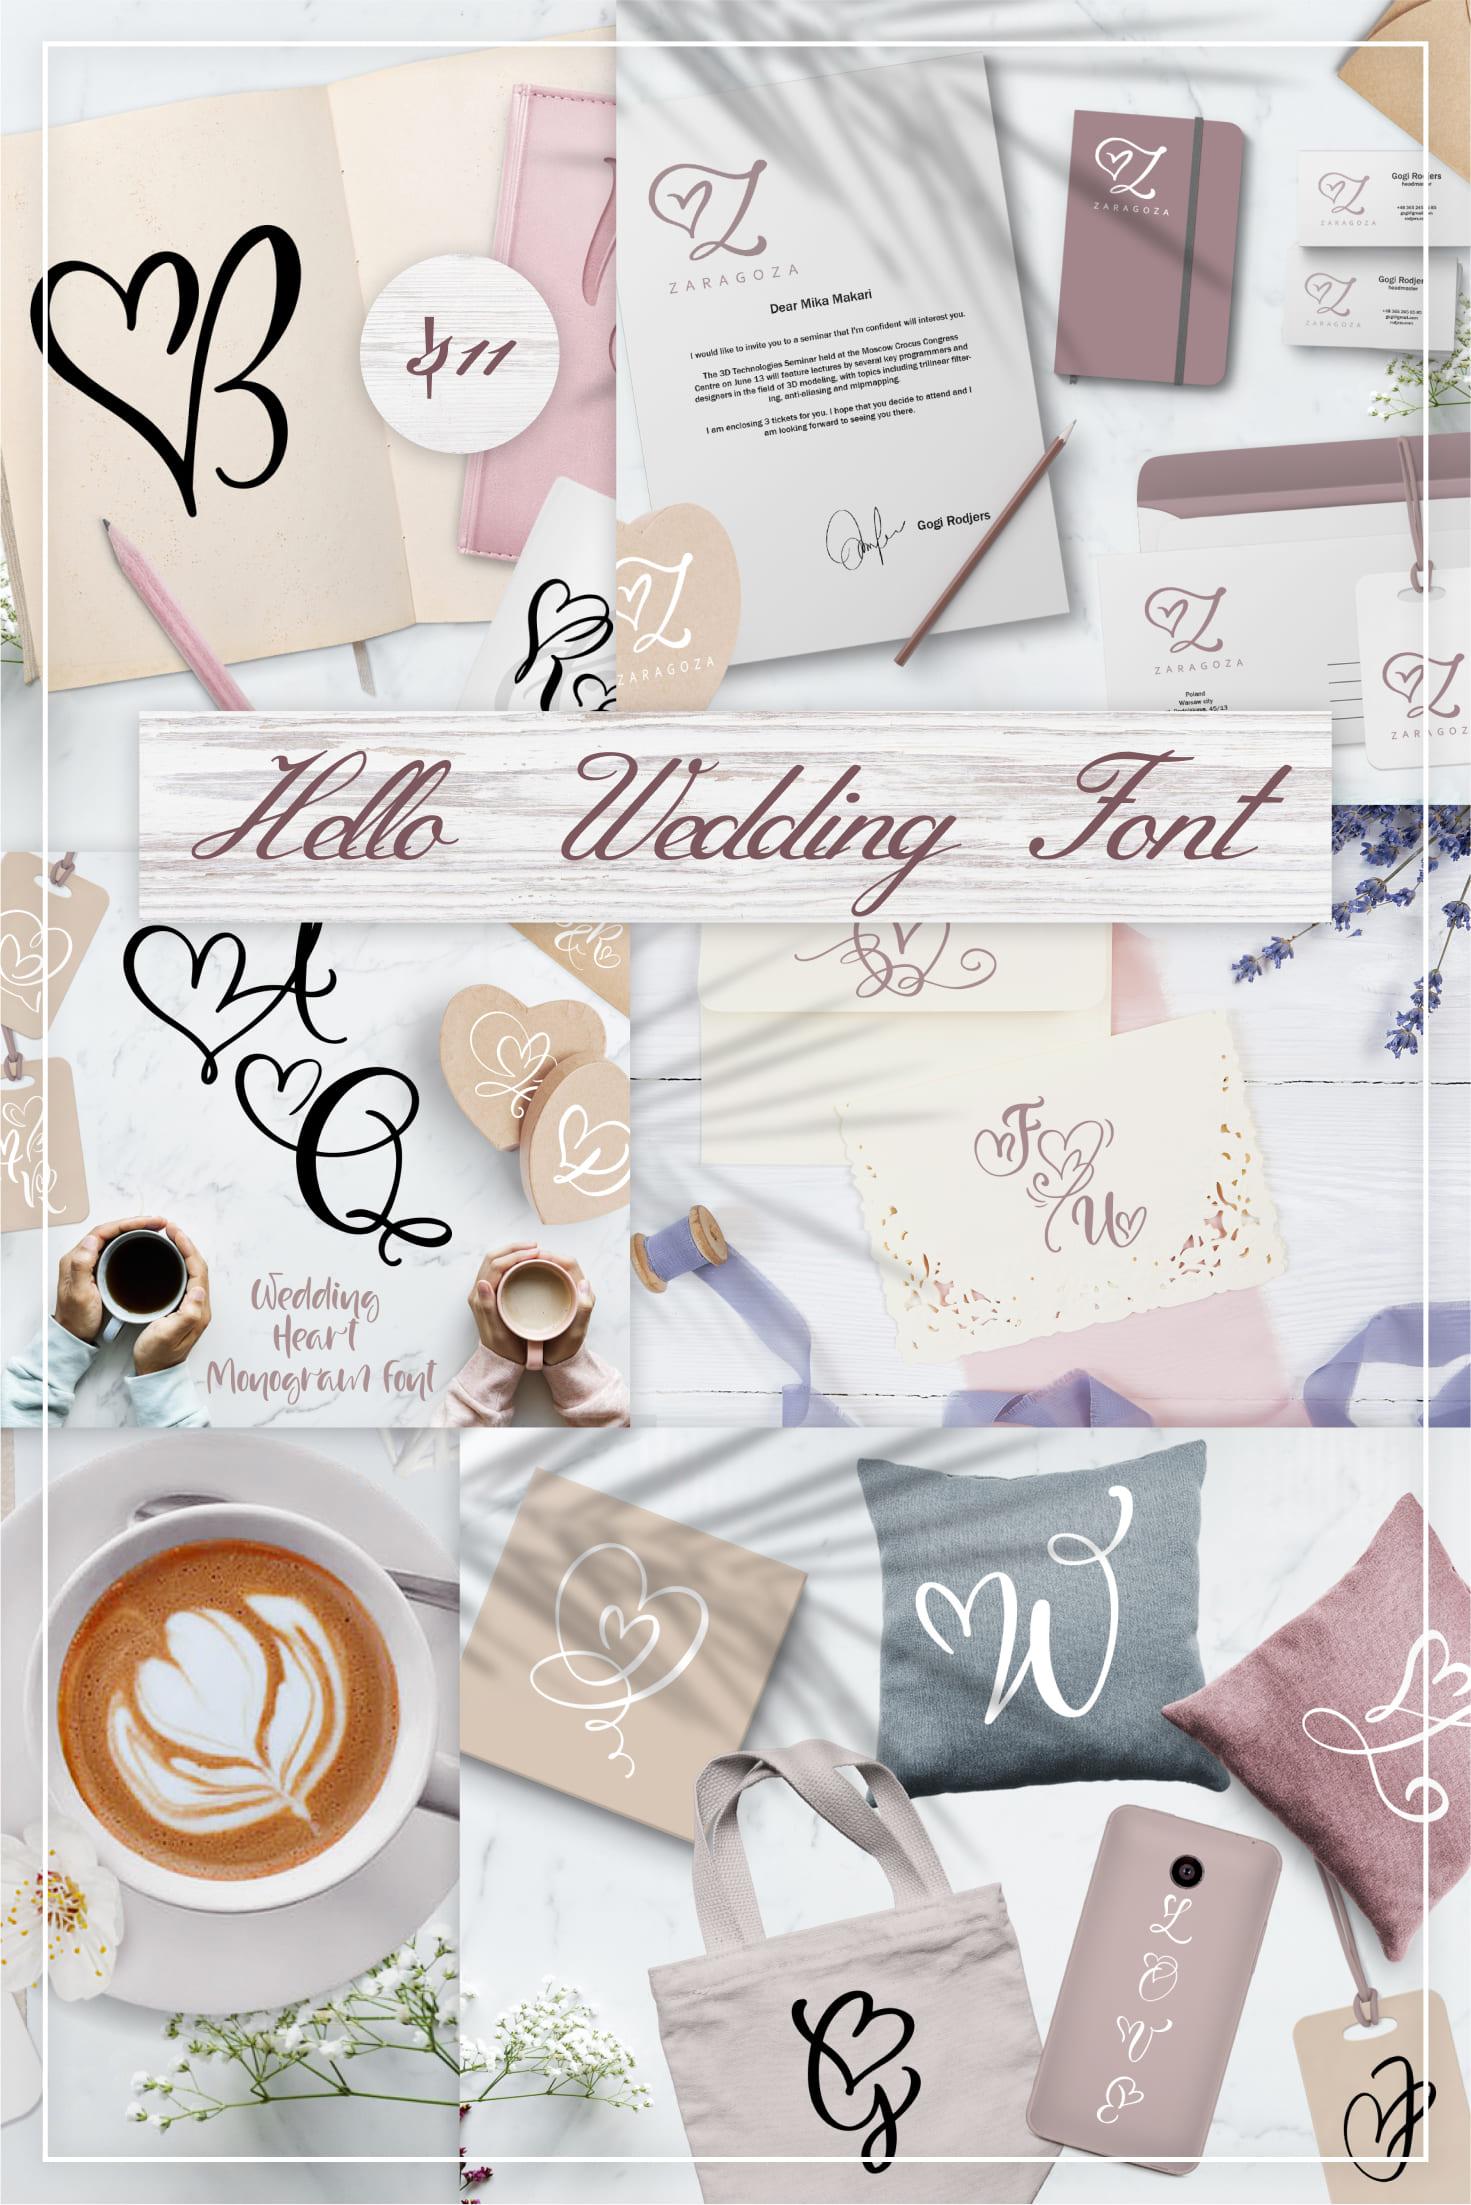 Pinterest Image: Hello Wedding Font: Wedding Heart Monogram Font.